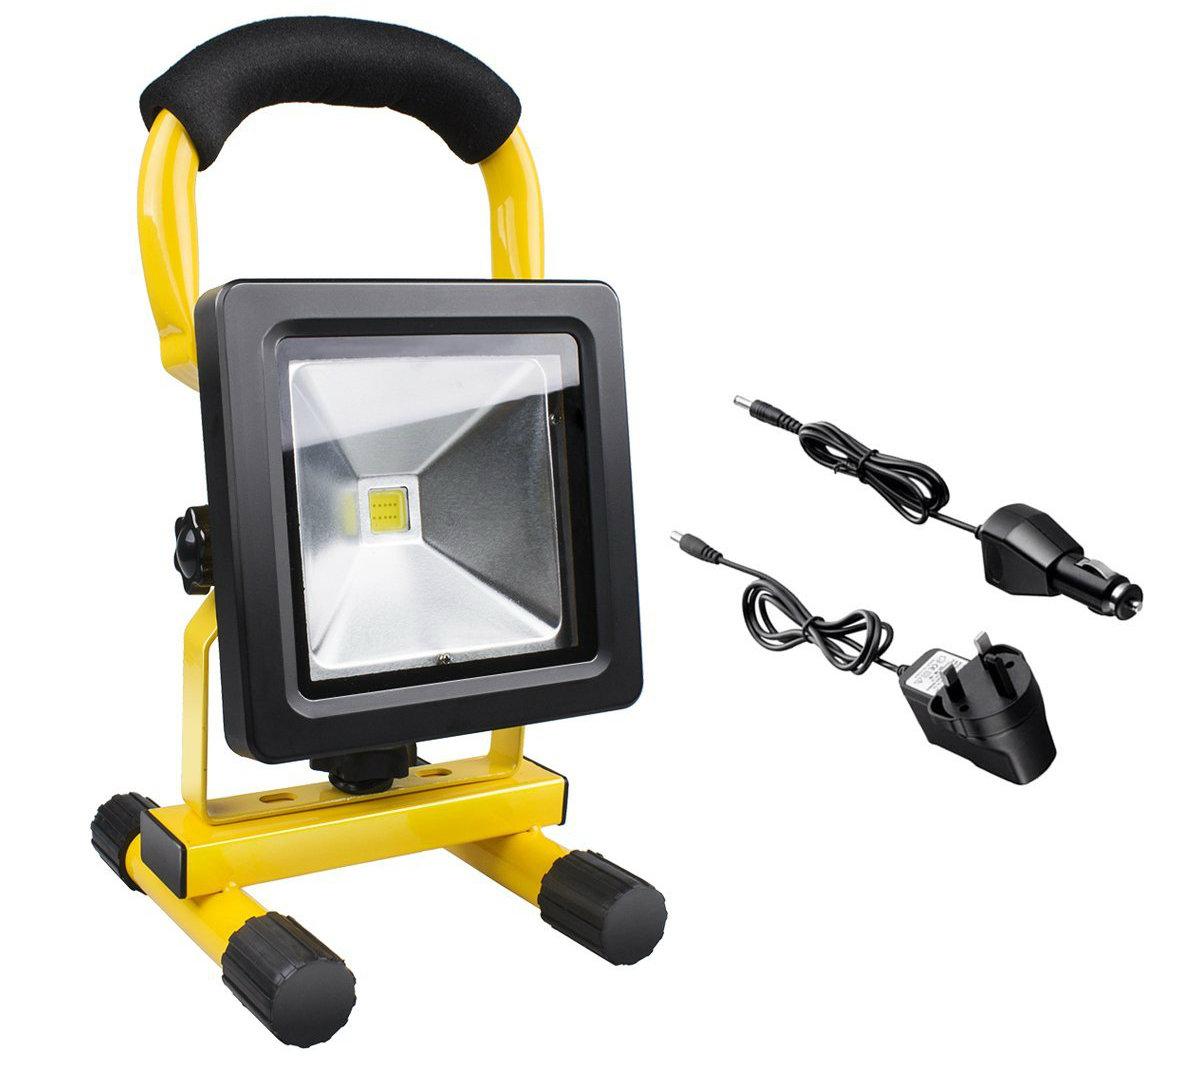 Best Led Work Lights Ledwatcher Versatile Emergency Lamp Morpilot Light